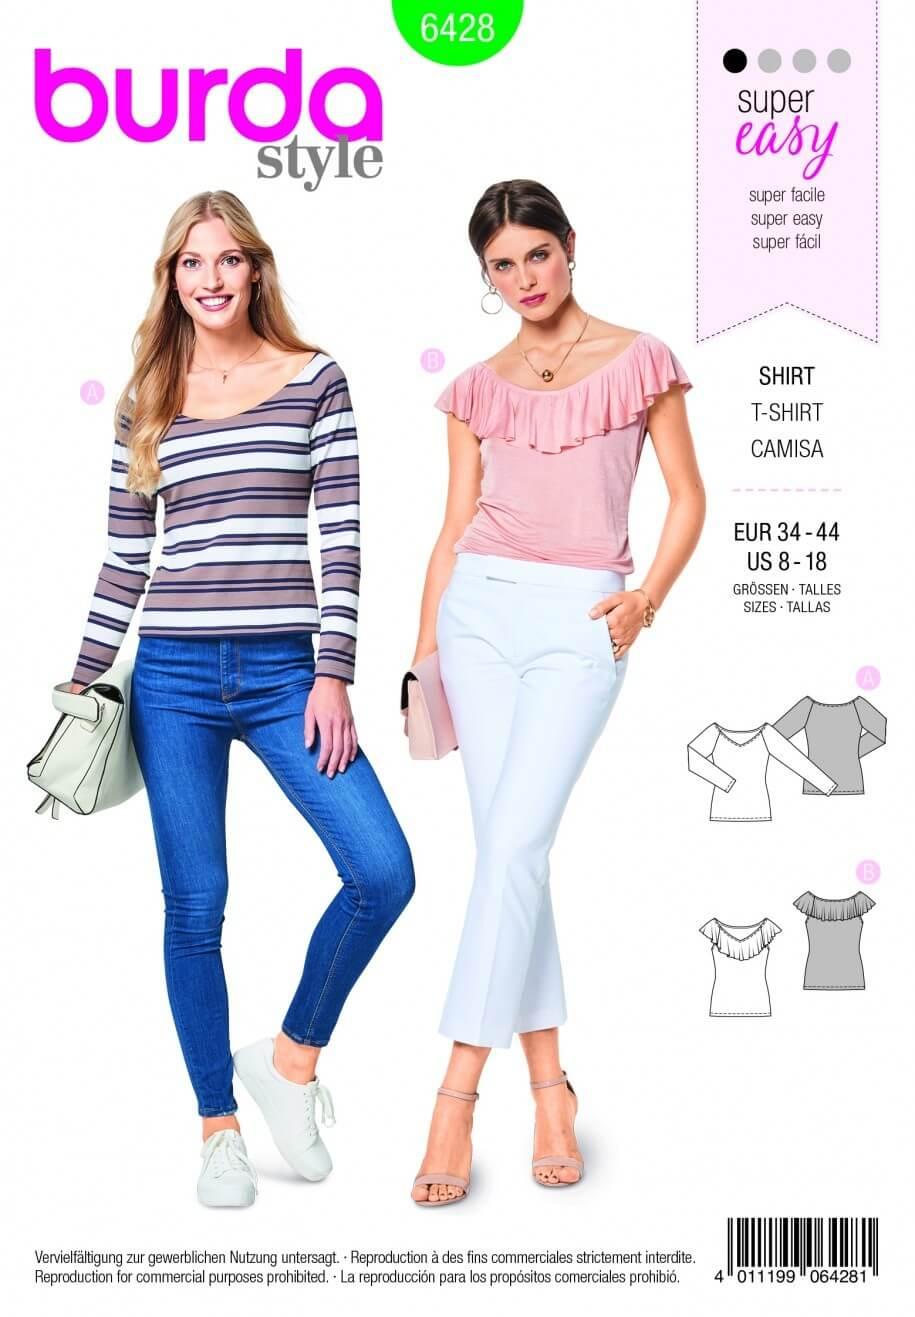 Burda Style Ladies Fitted TShirt Top Fabric Sewing Pattern 6428